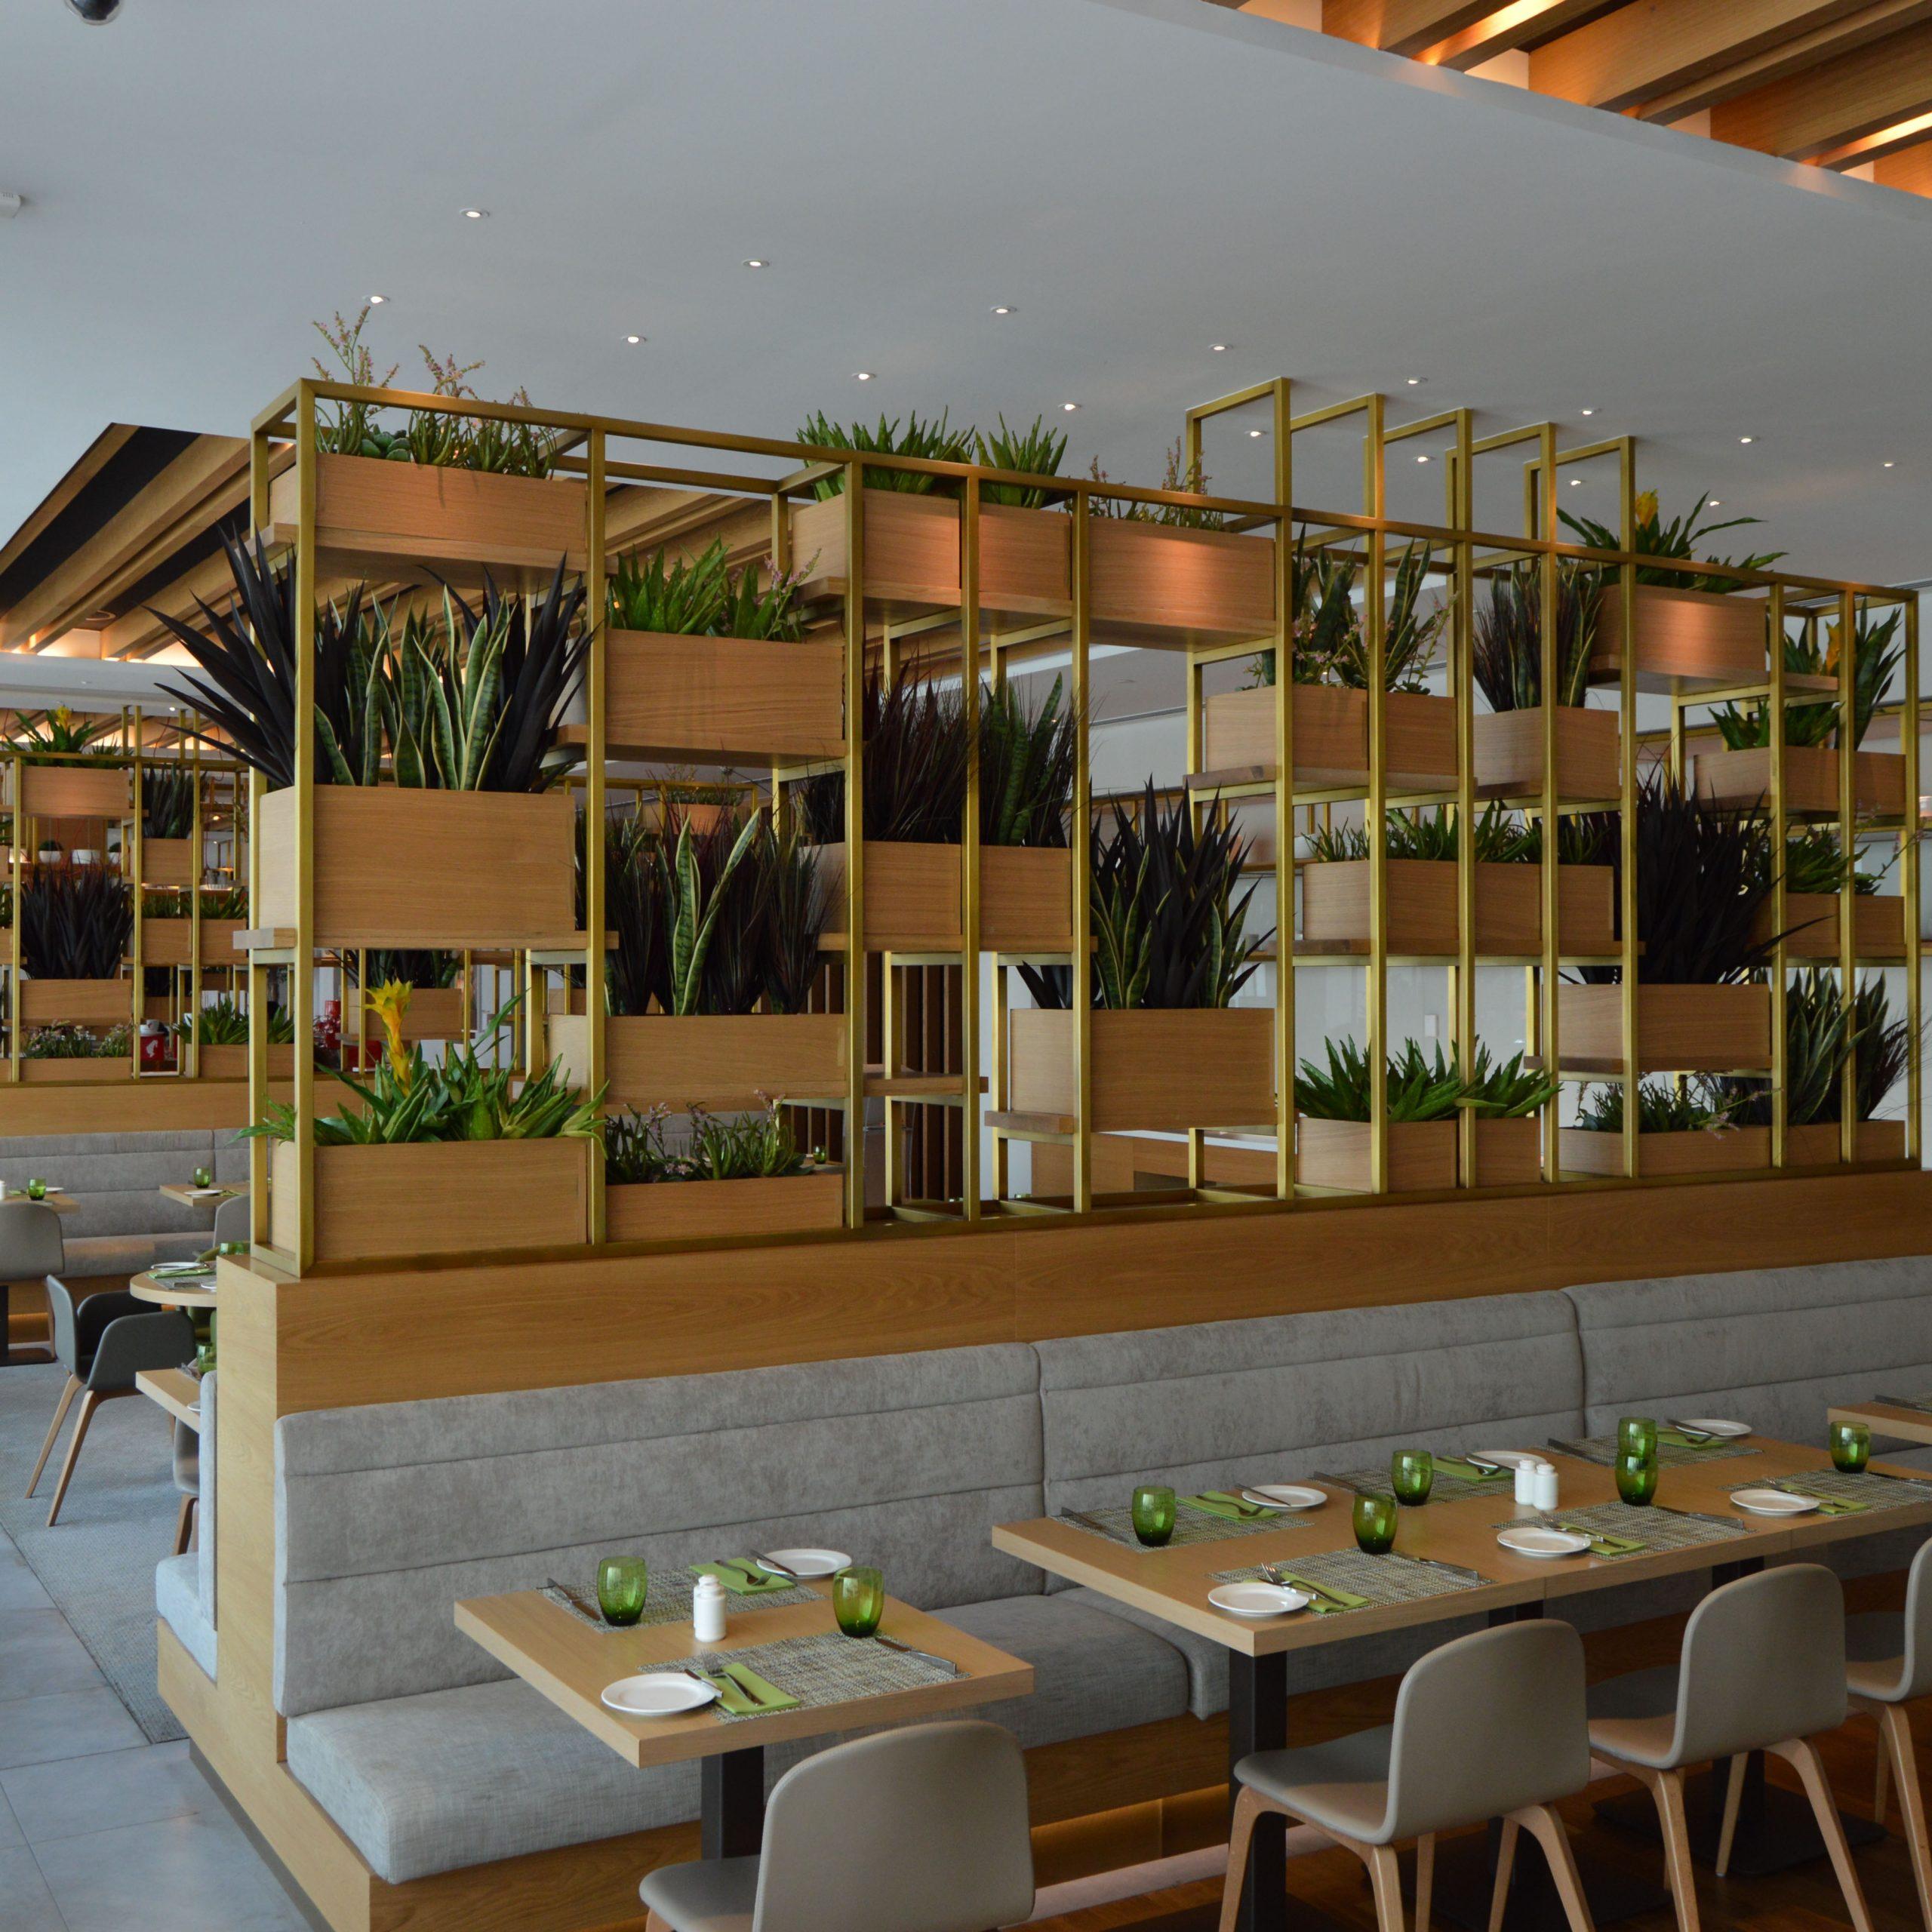 Hilton Garden Inn – Dubai, UAE